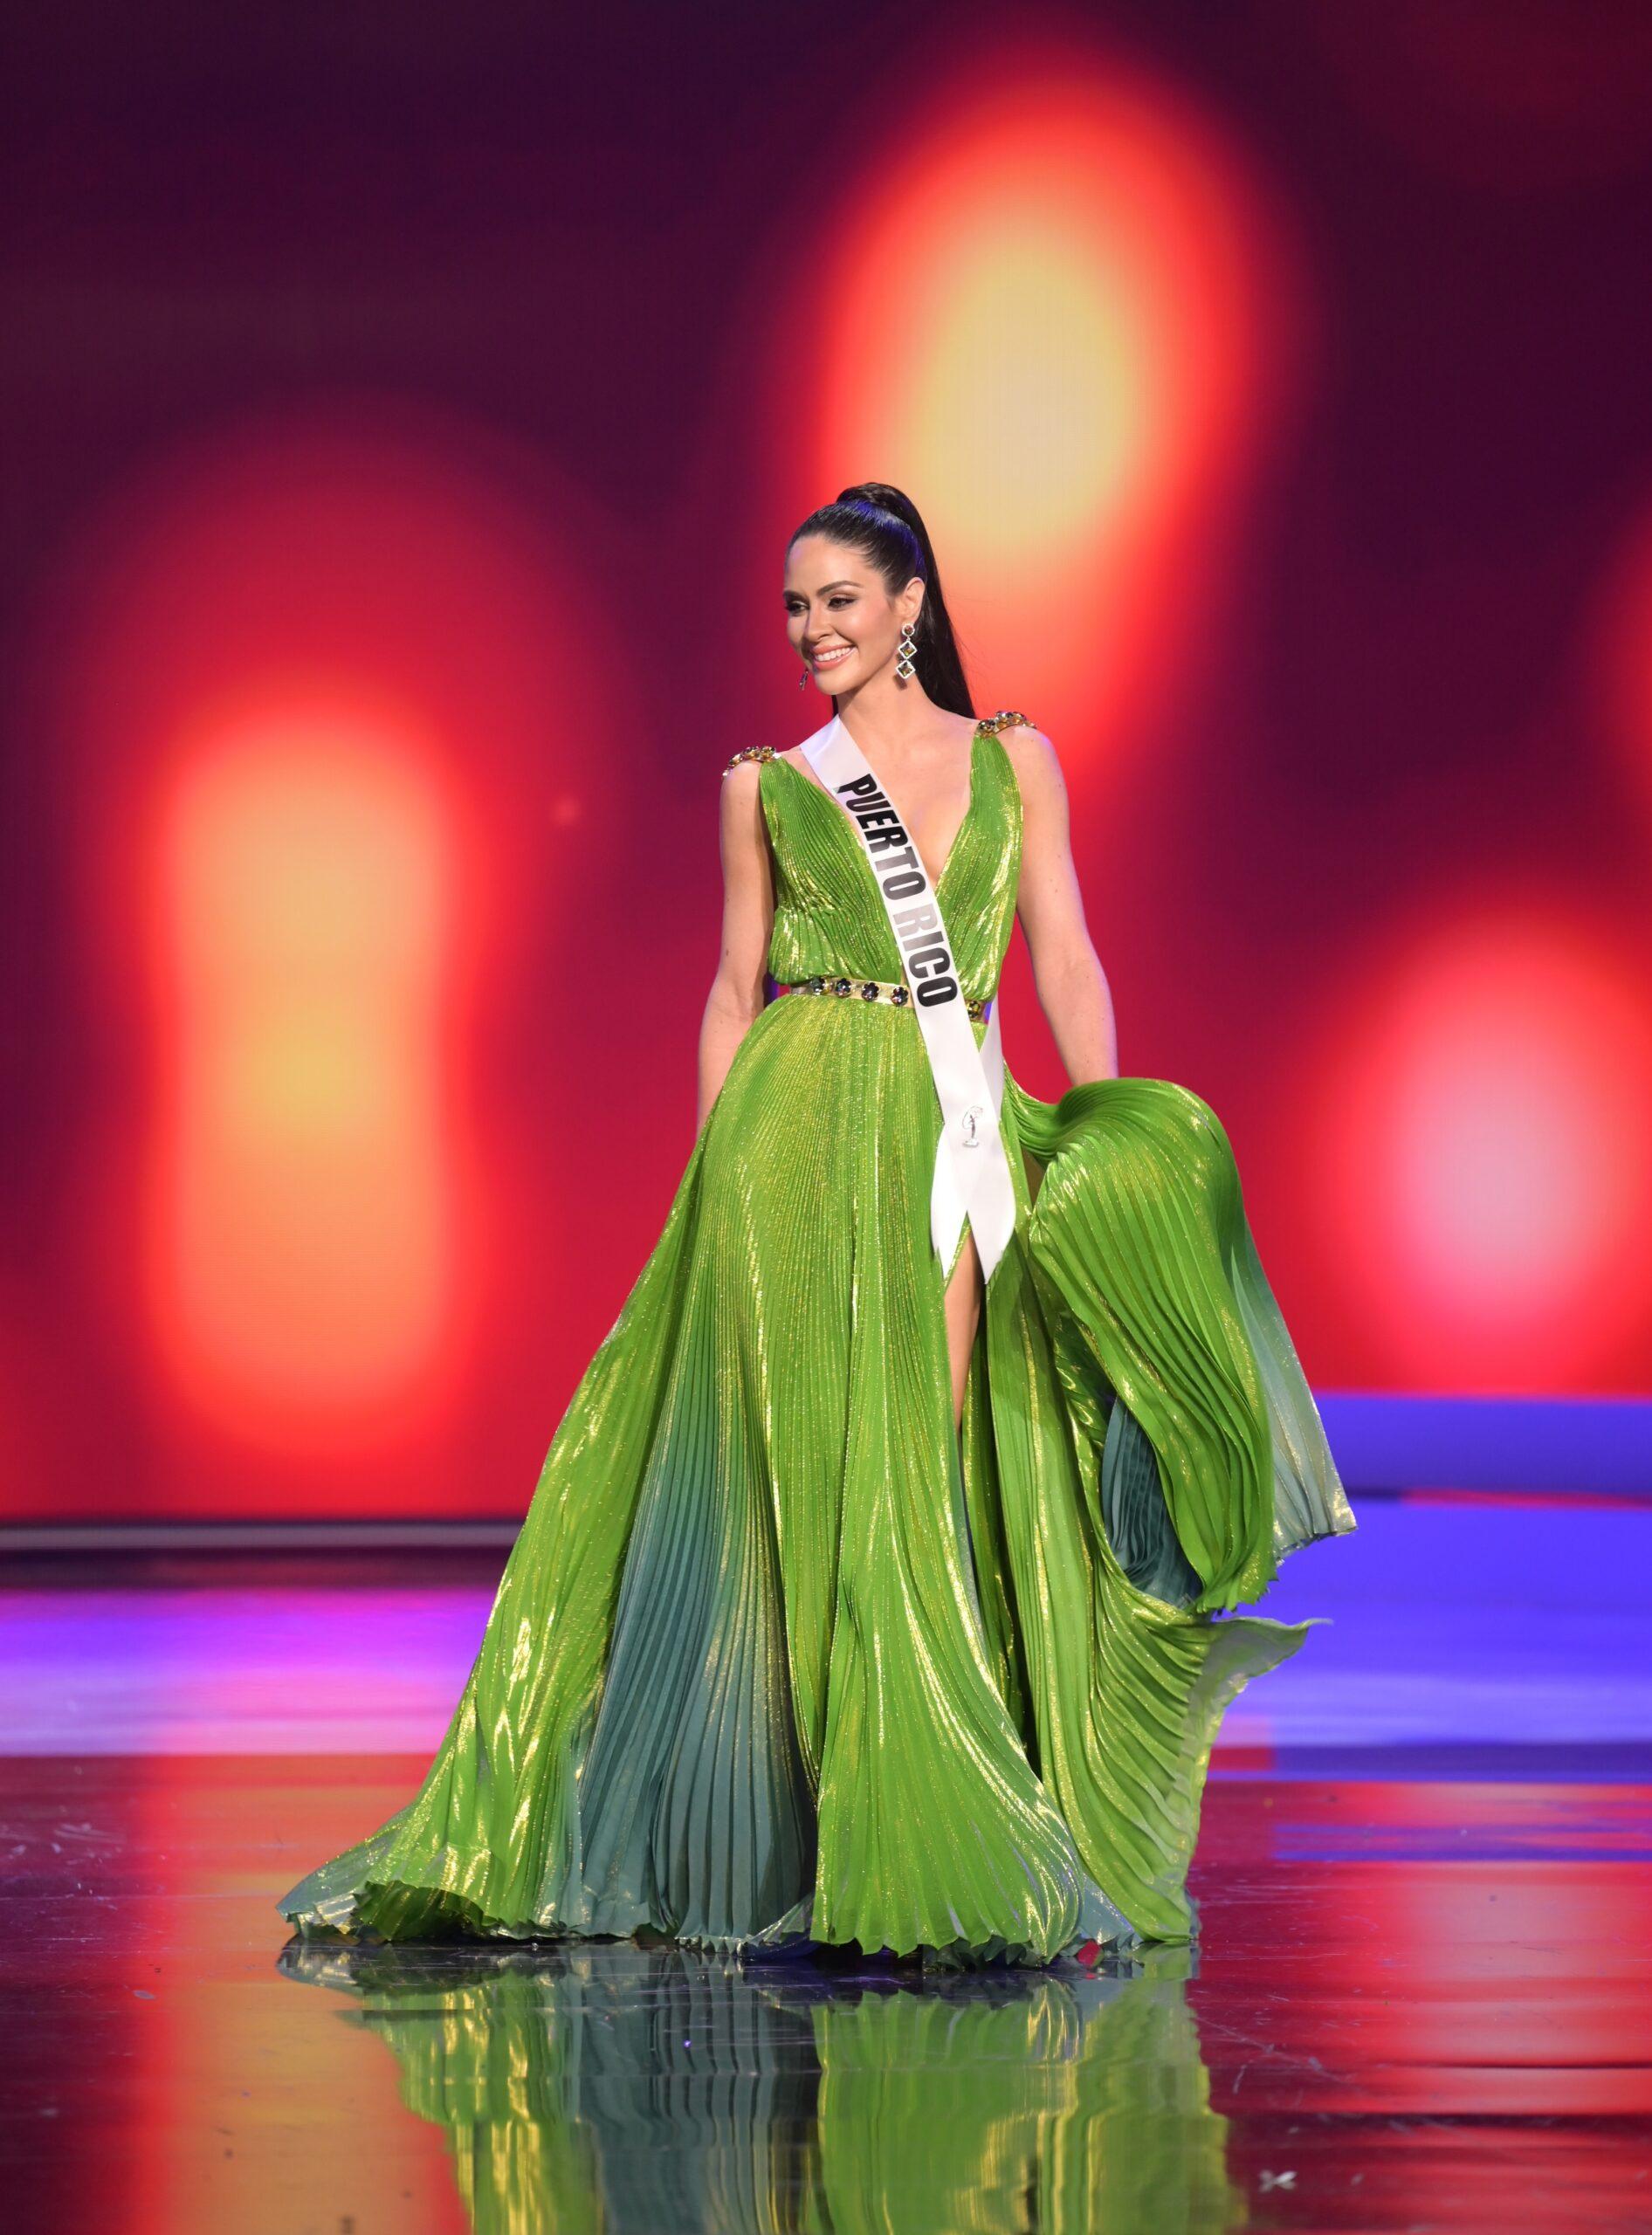 Cuenta regresiva para noche final del Miss Universo